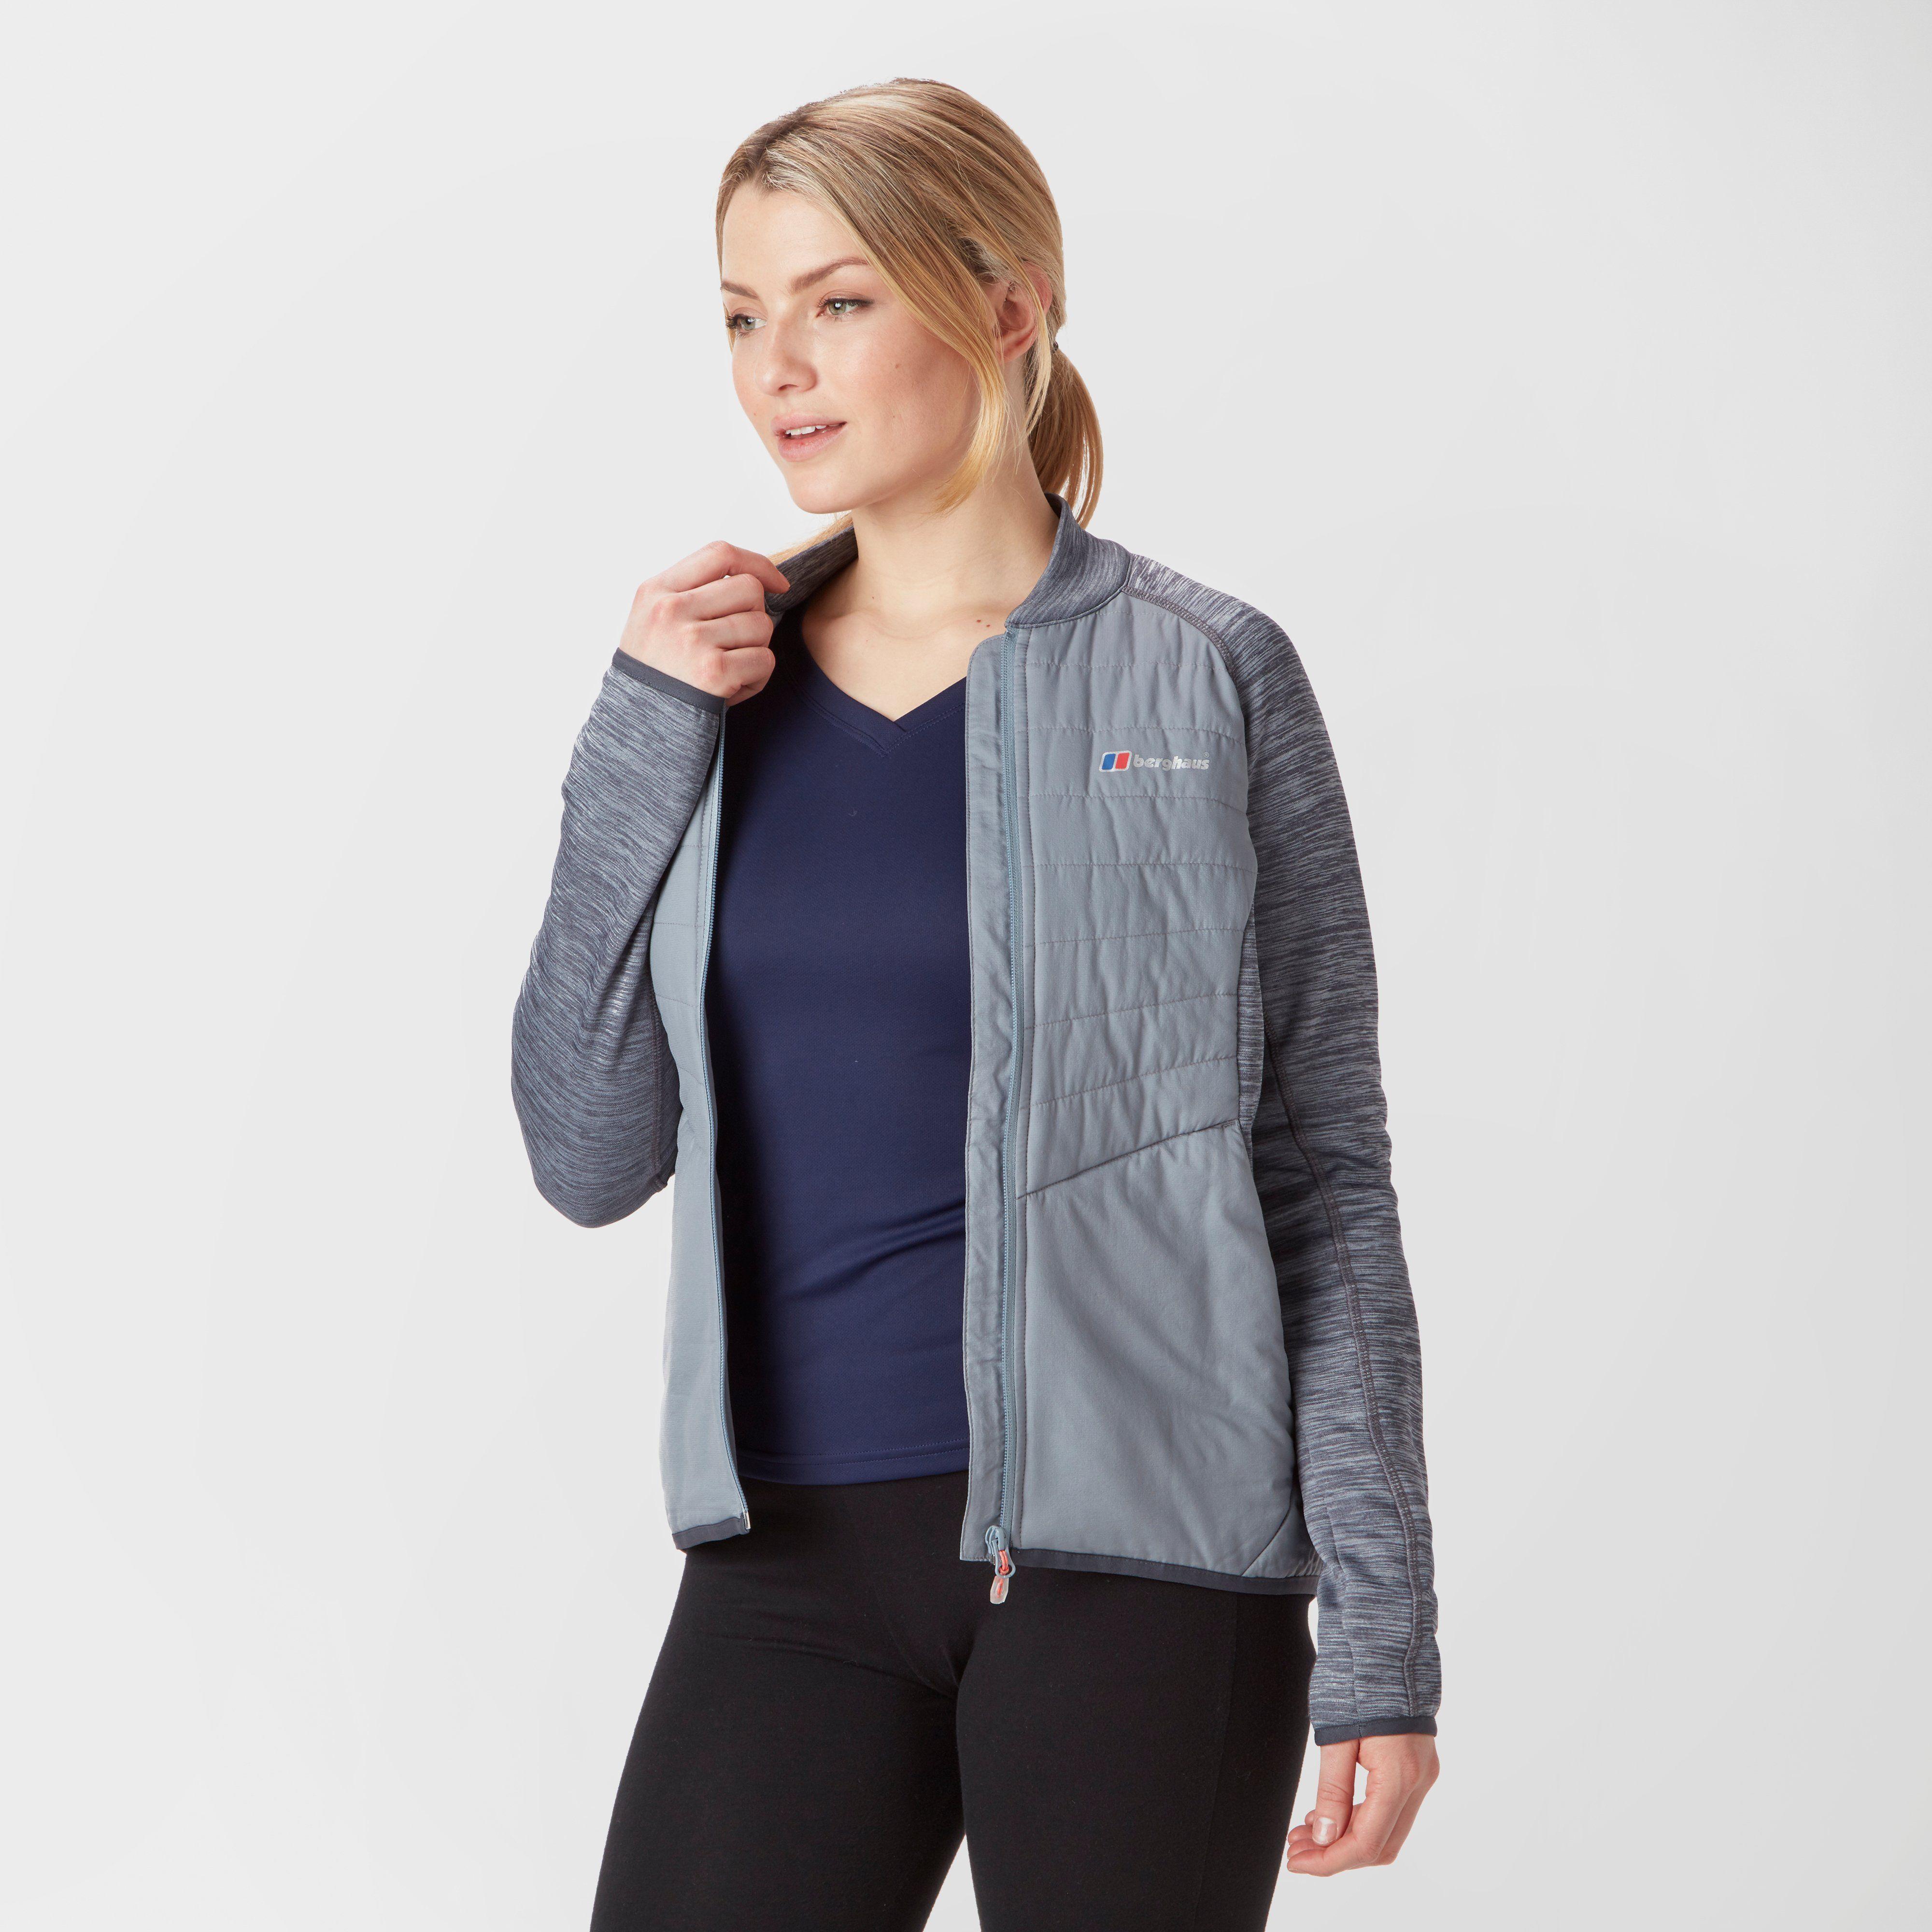 BERGHAUS Women's Gemini Hybrid Jacket